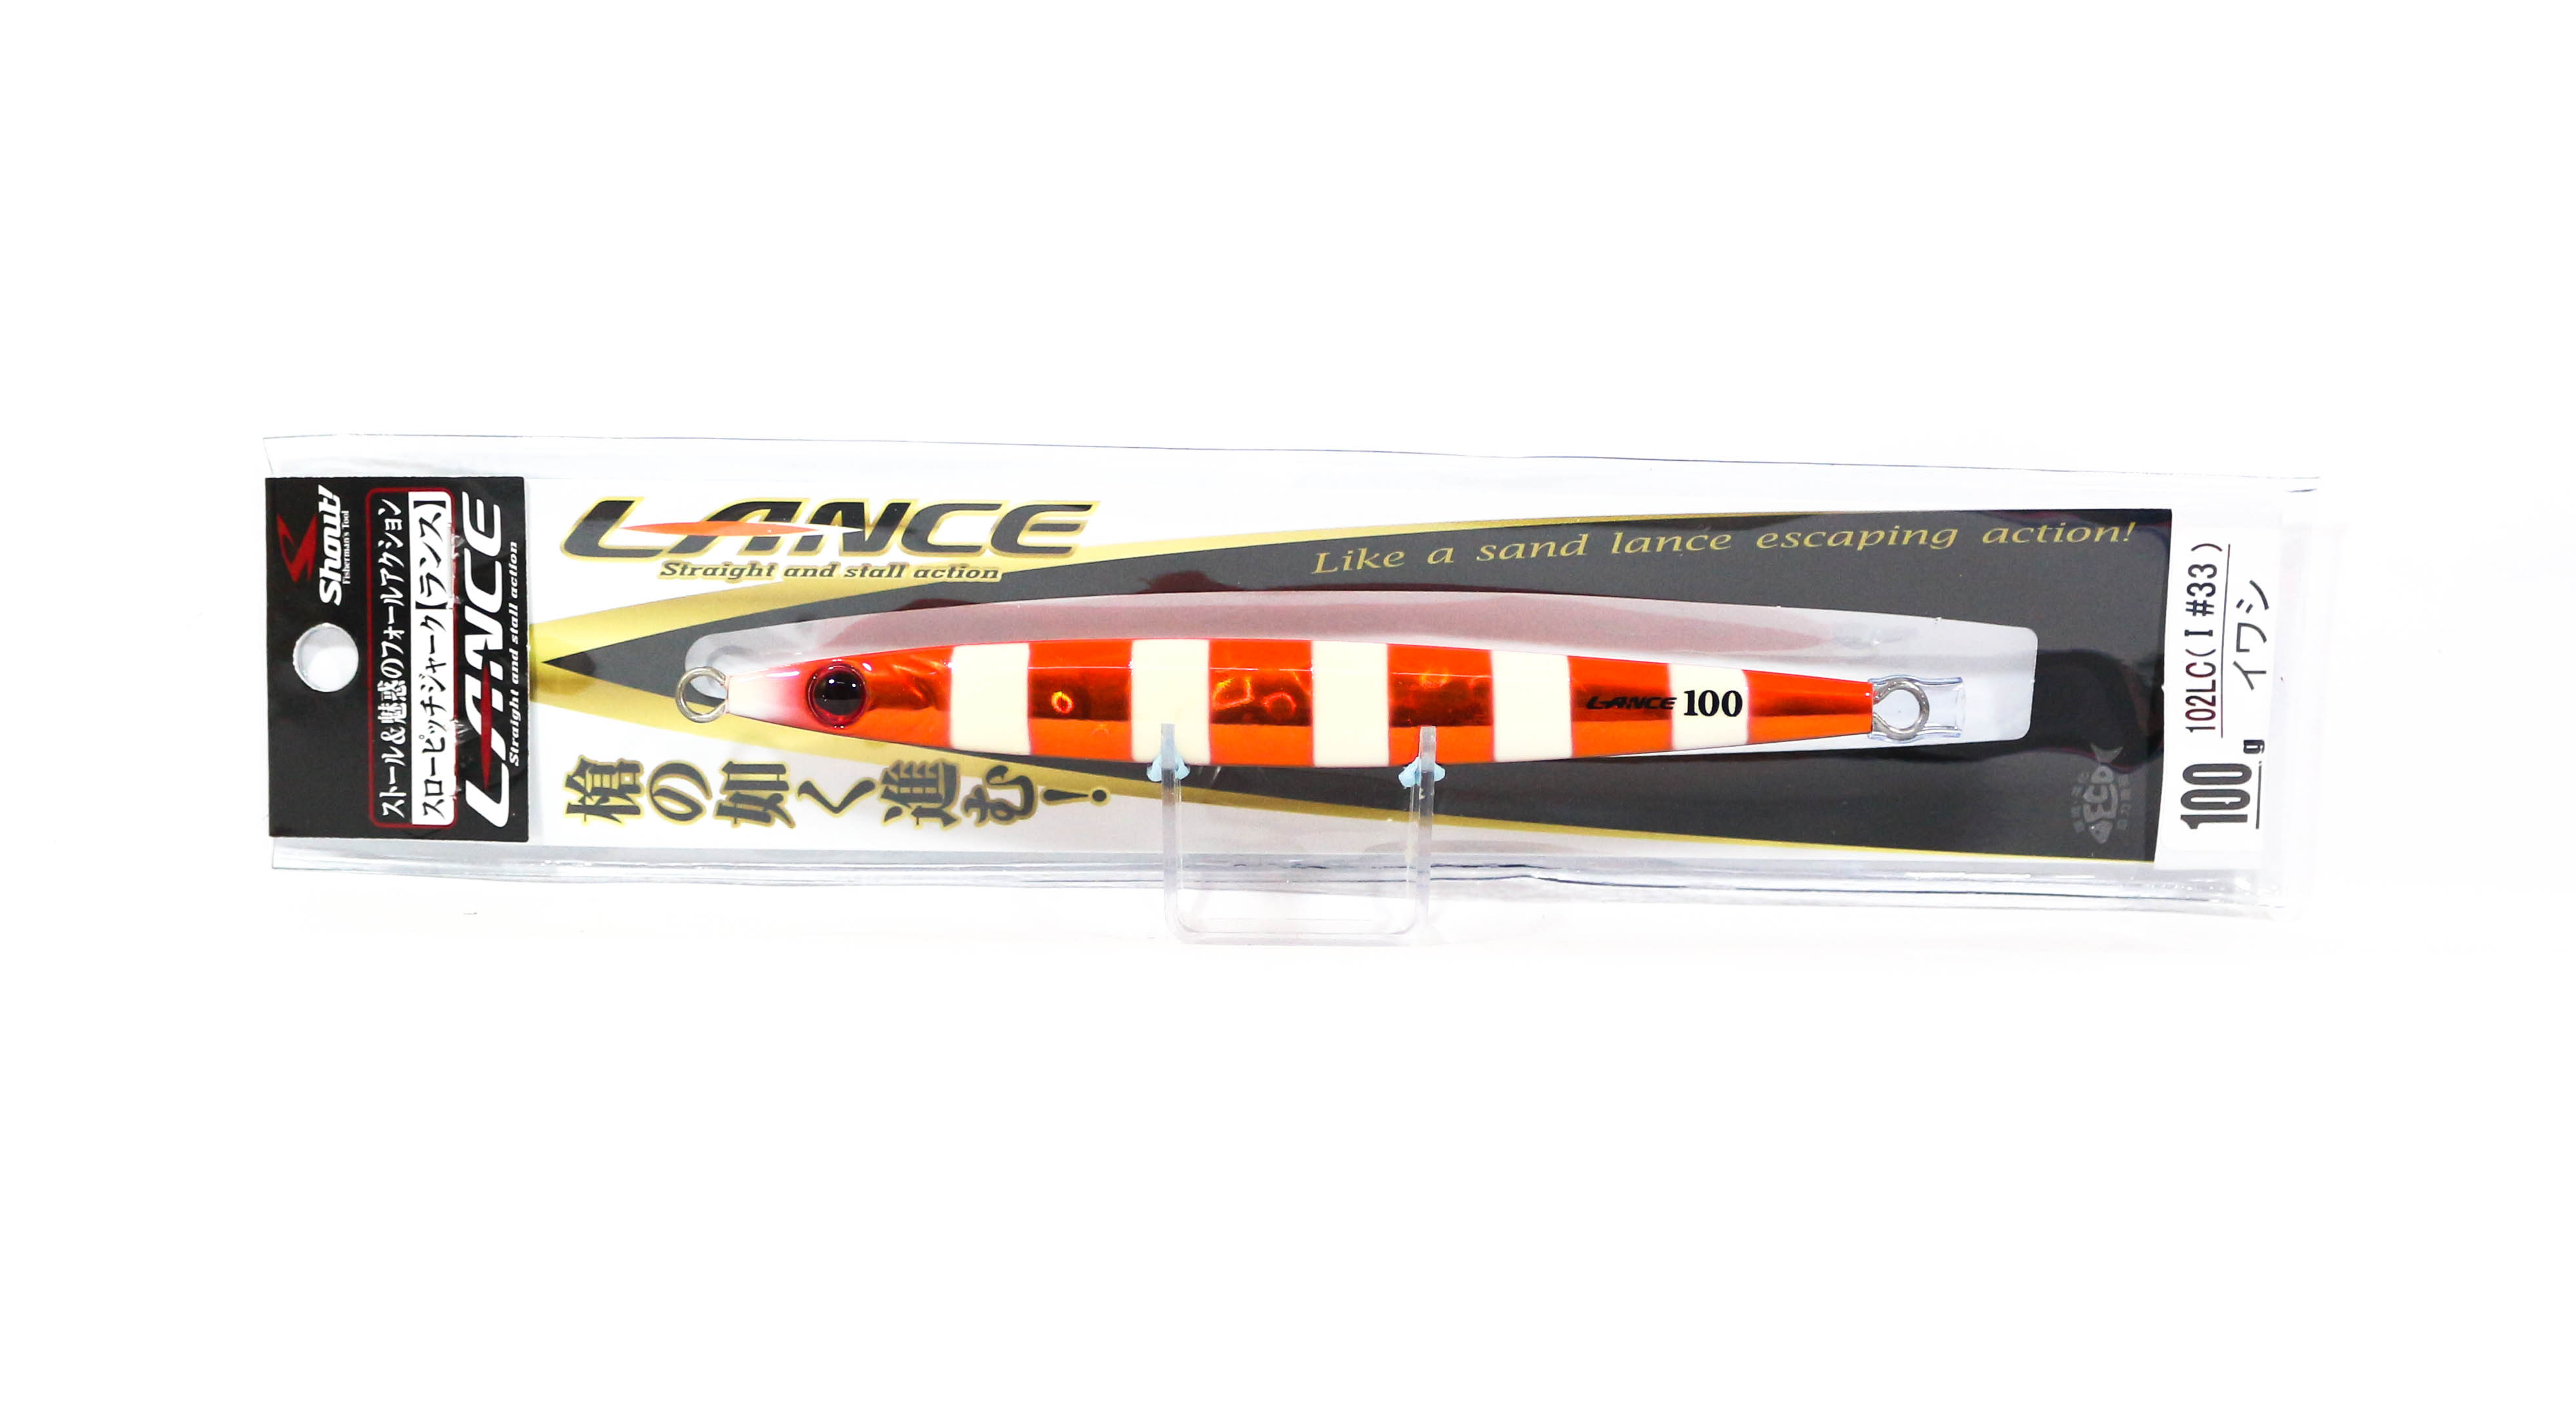 Shout 102-LC Metal Jig Lance Slow Fall Long 100 grams RZ (7918)